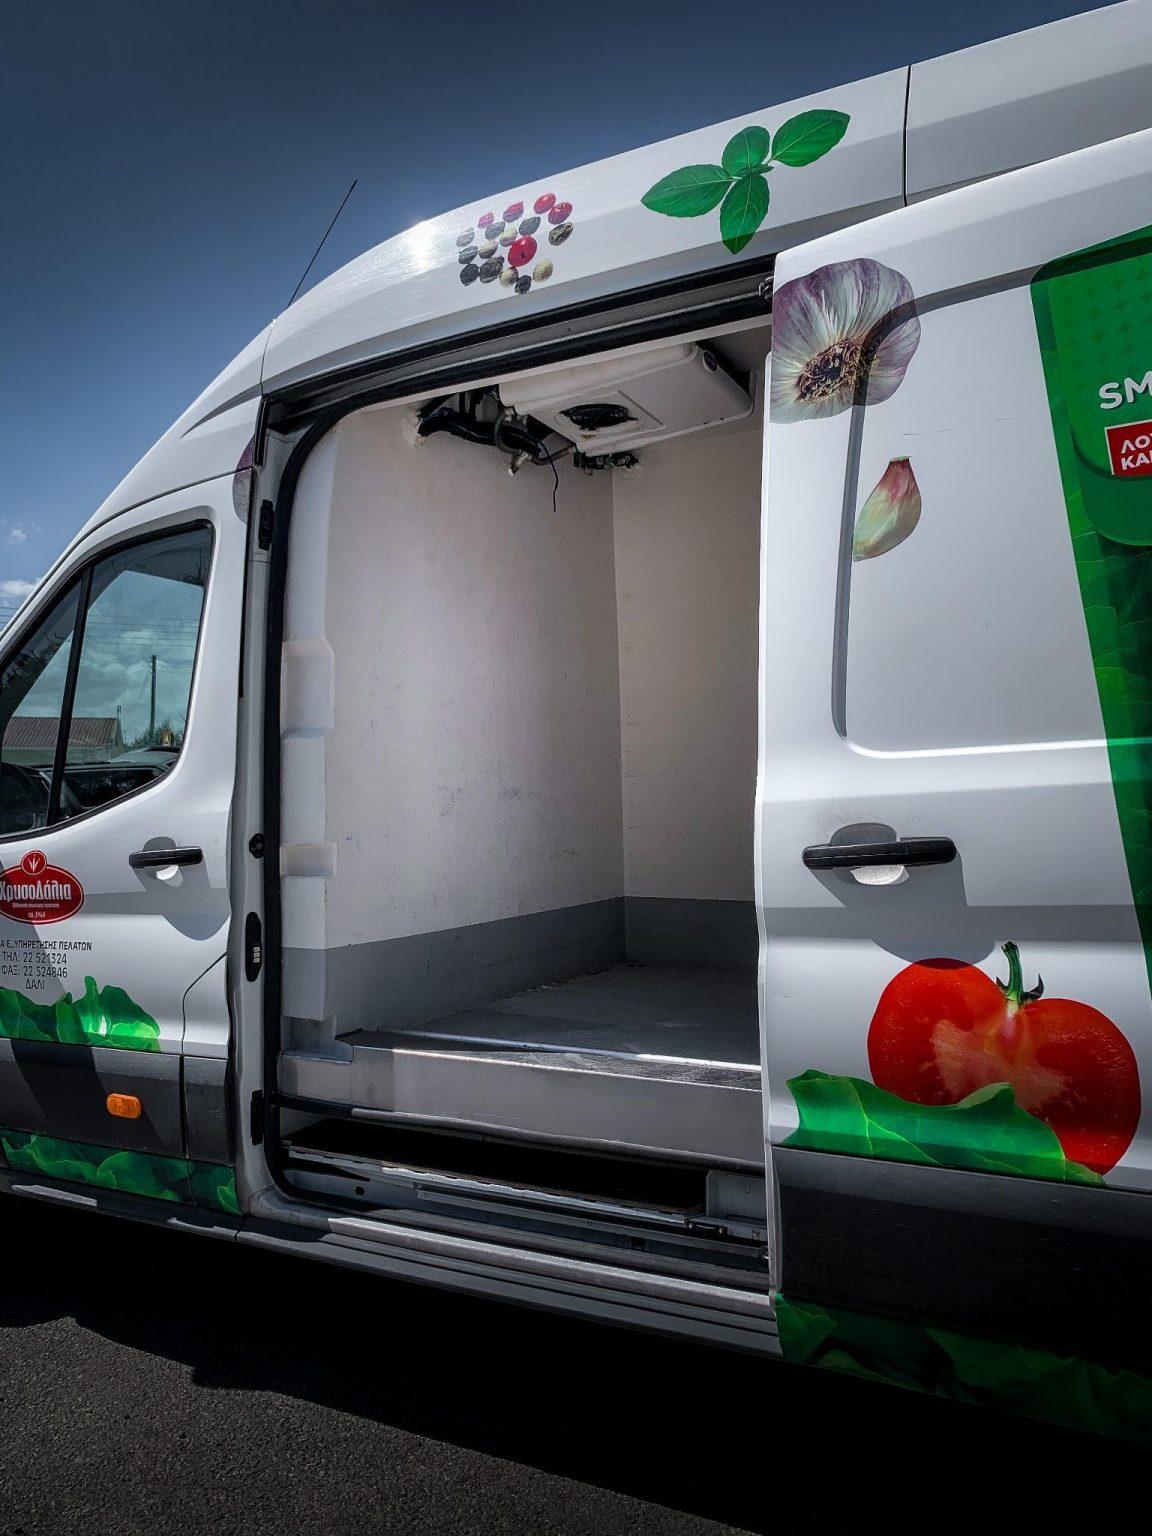 Inside a food distribution truck